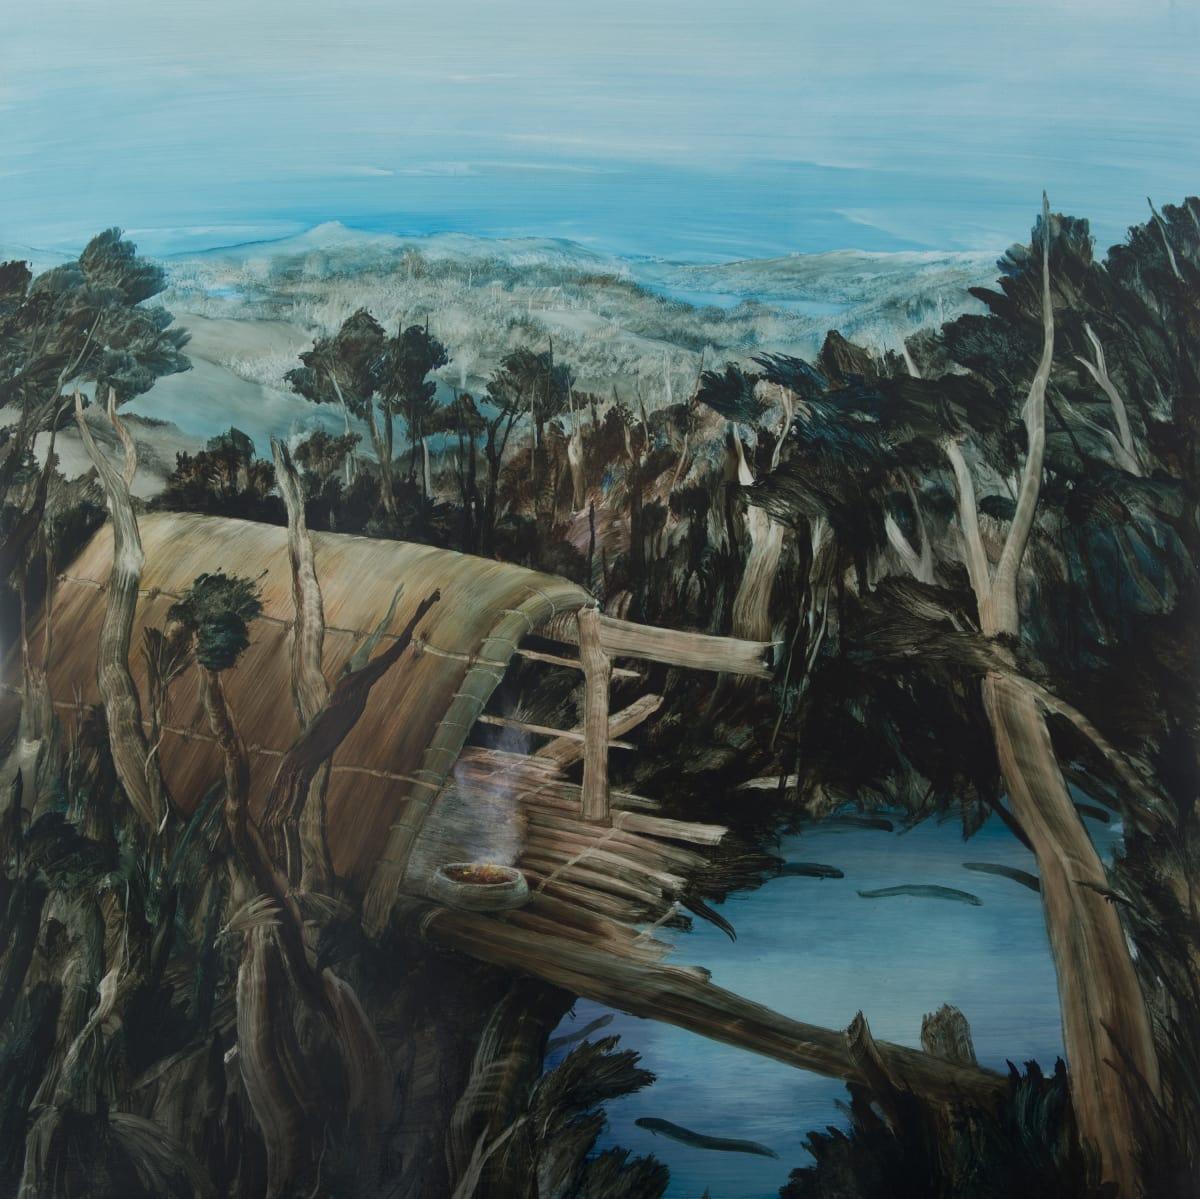 John WALSH Mangatuna, 2015 Oil on board 47.2 x 47.2 in 120 x 120 cm